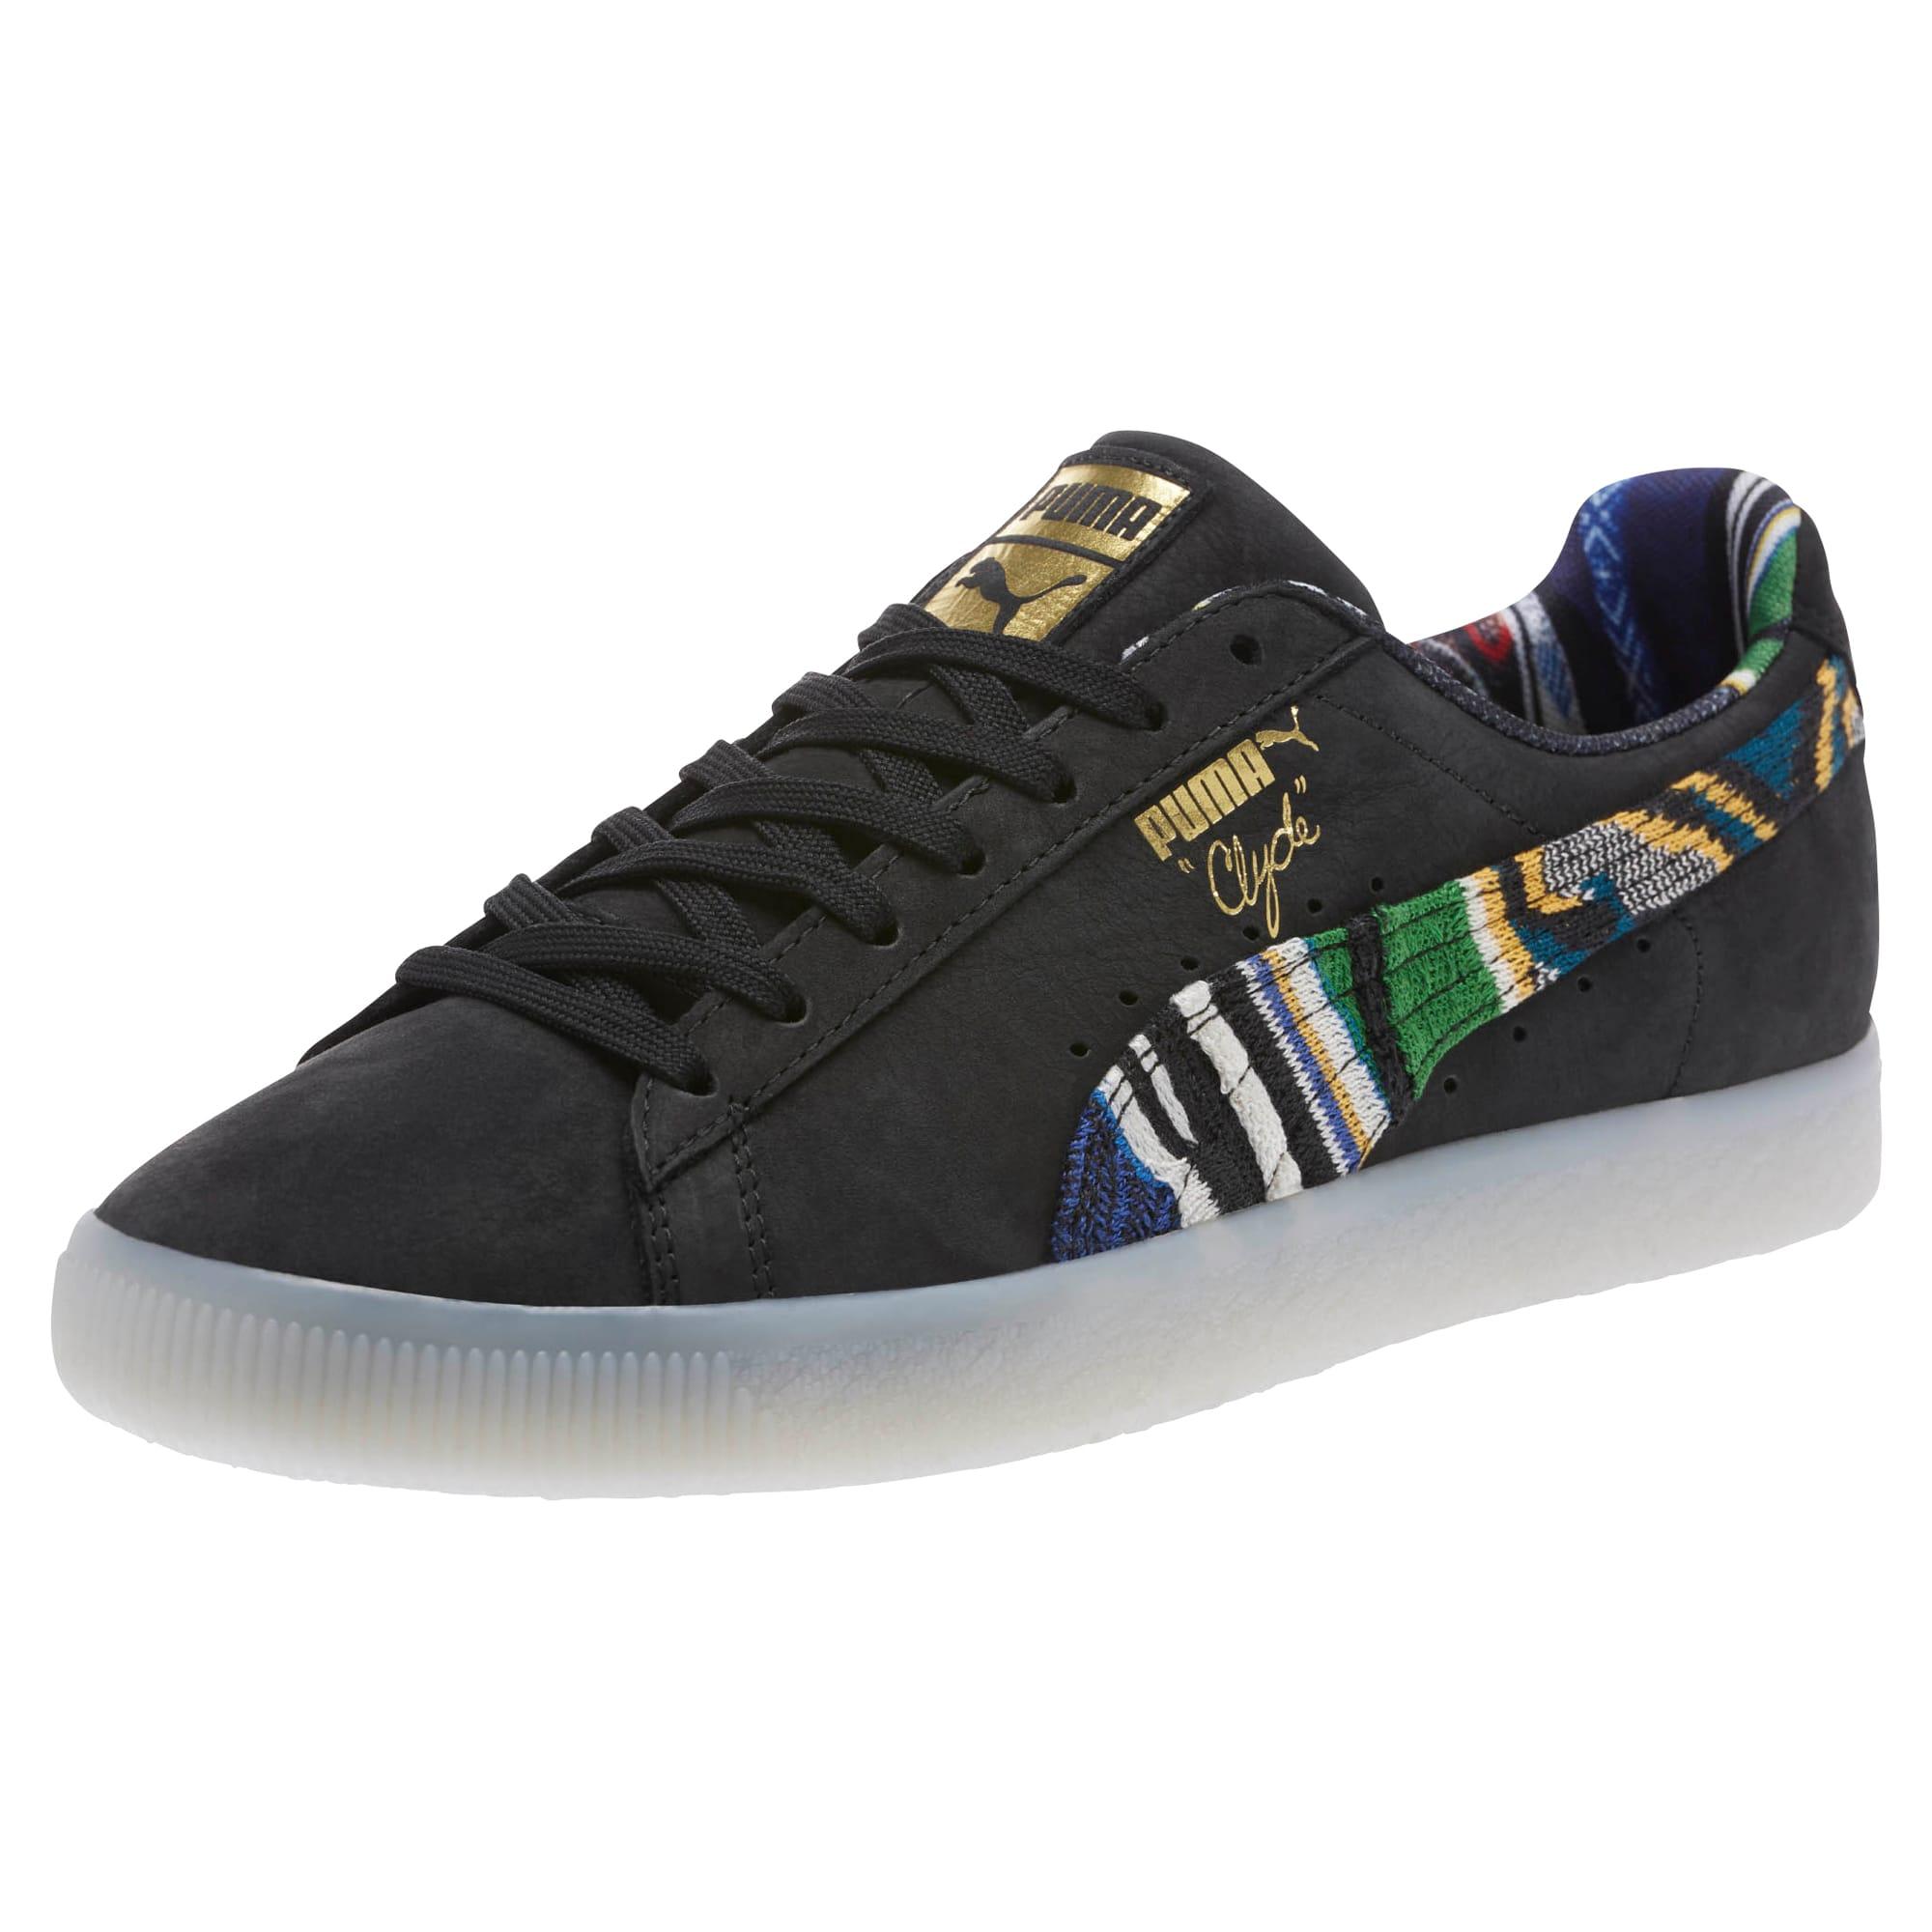 Mens Puma Coogi Clyde Formstrip Sneakers Black